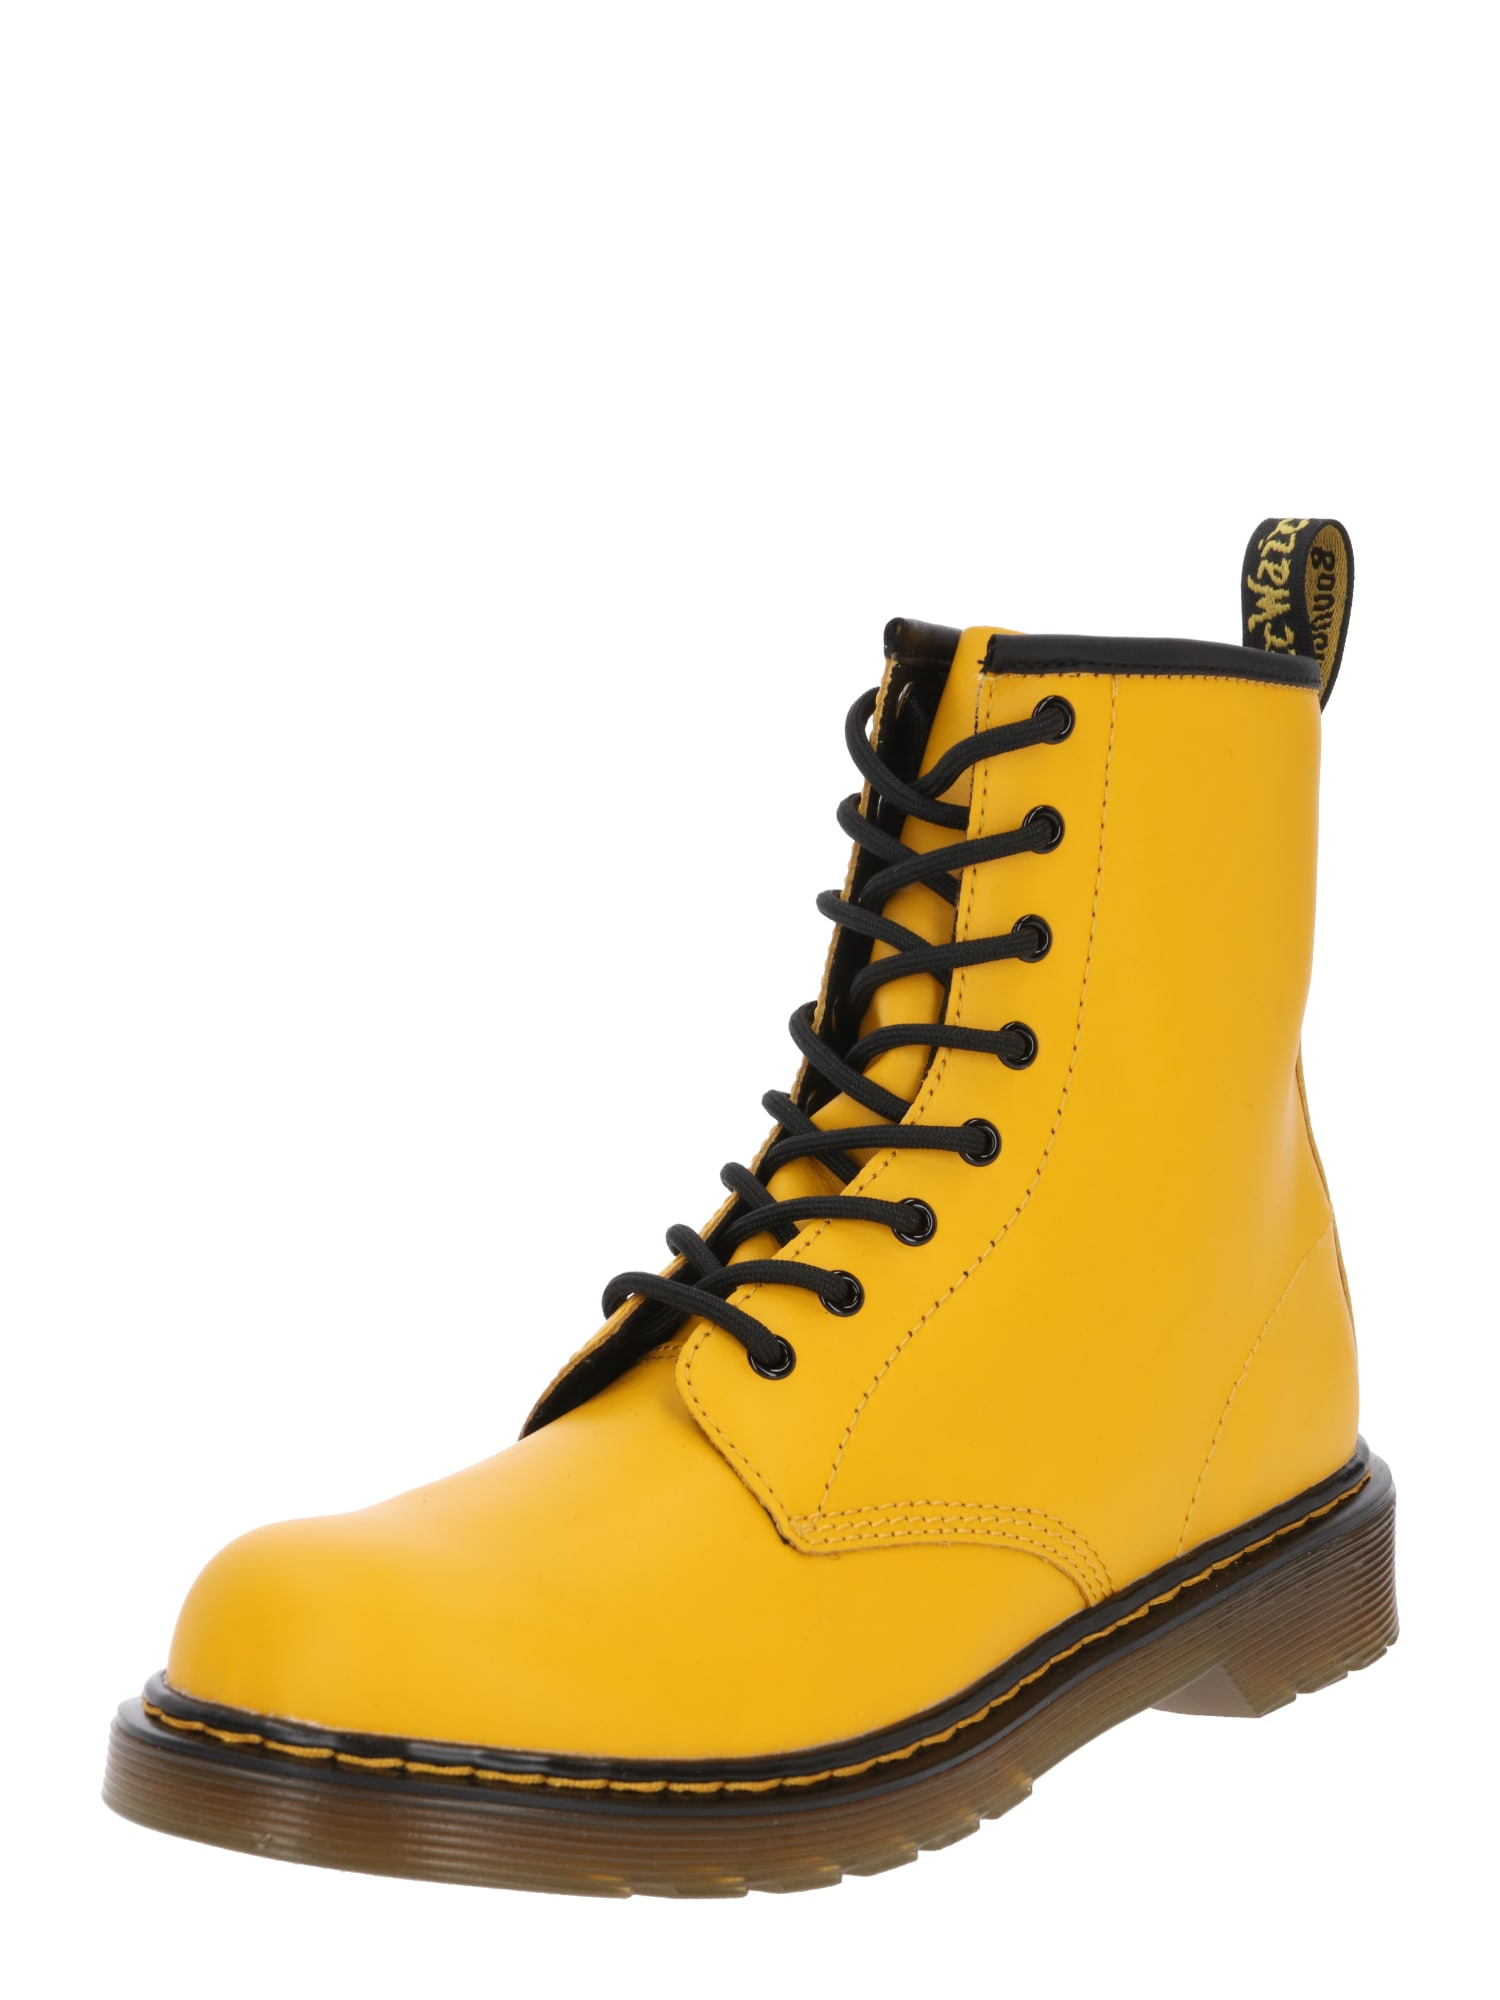 Dr. Martens Auliniai geltona / juoda